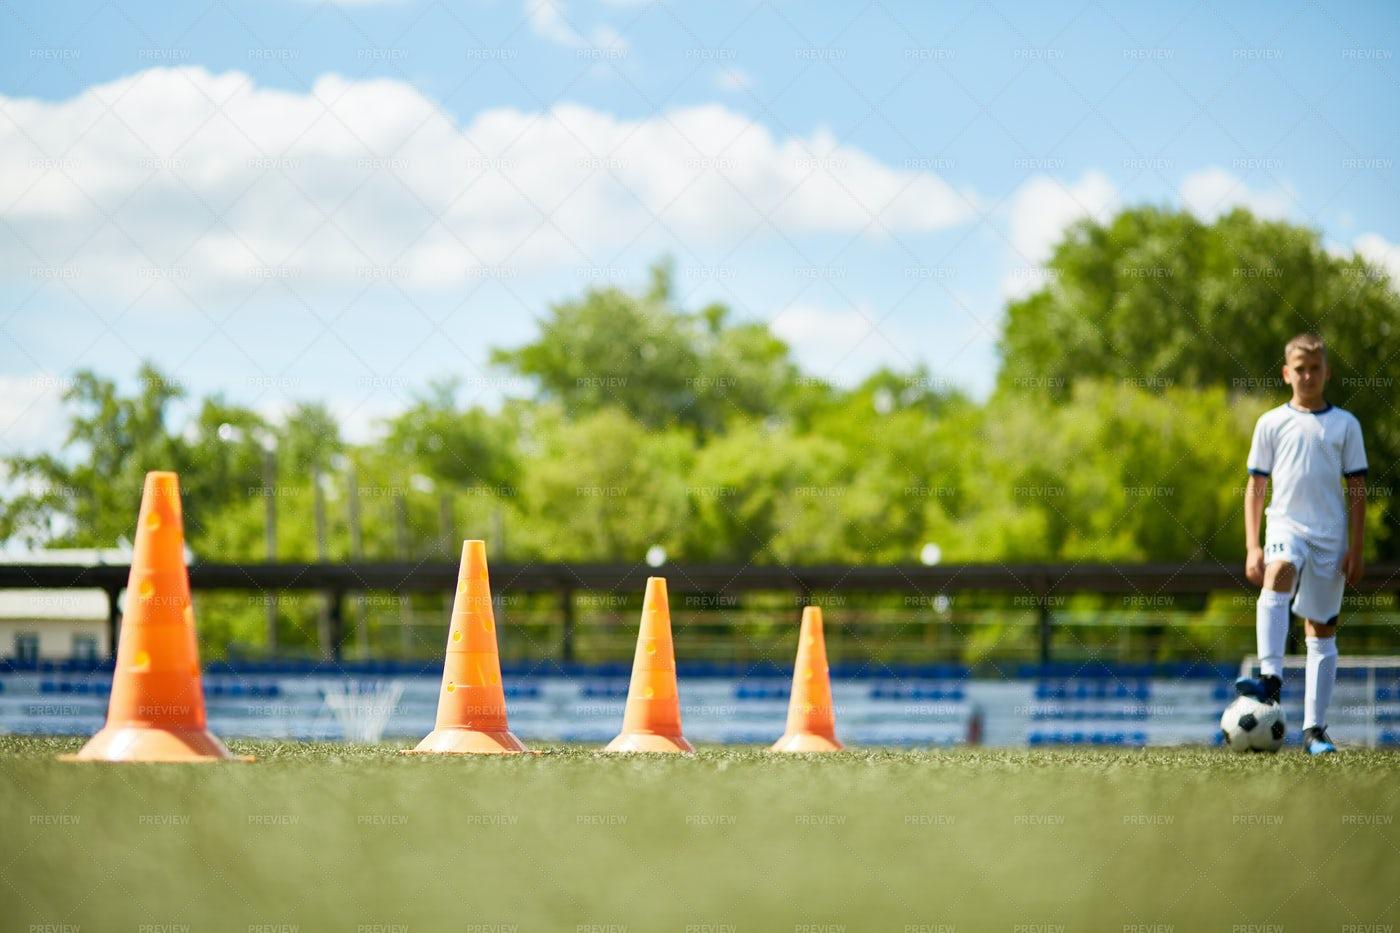 Row Of Cones In Football Field: Stock Photos